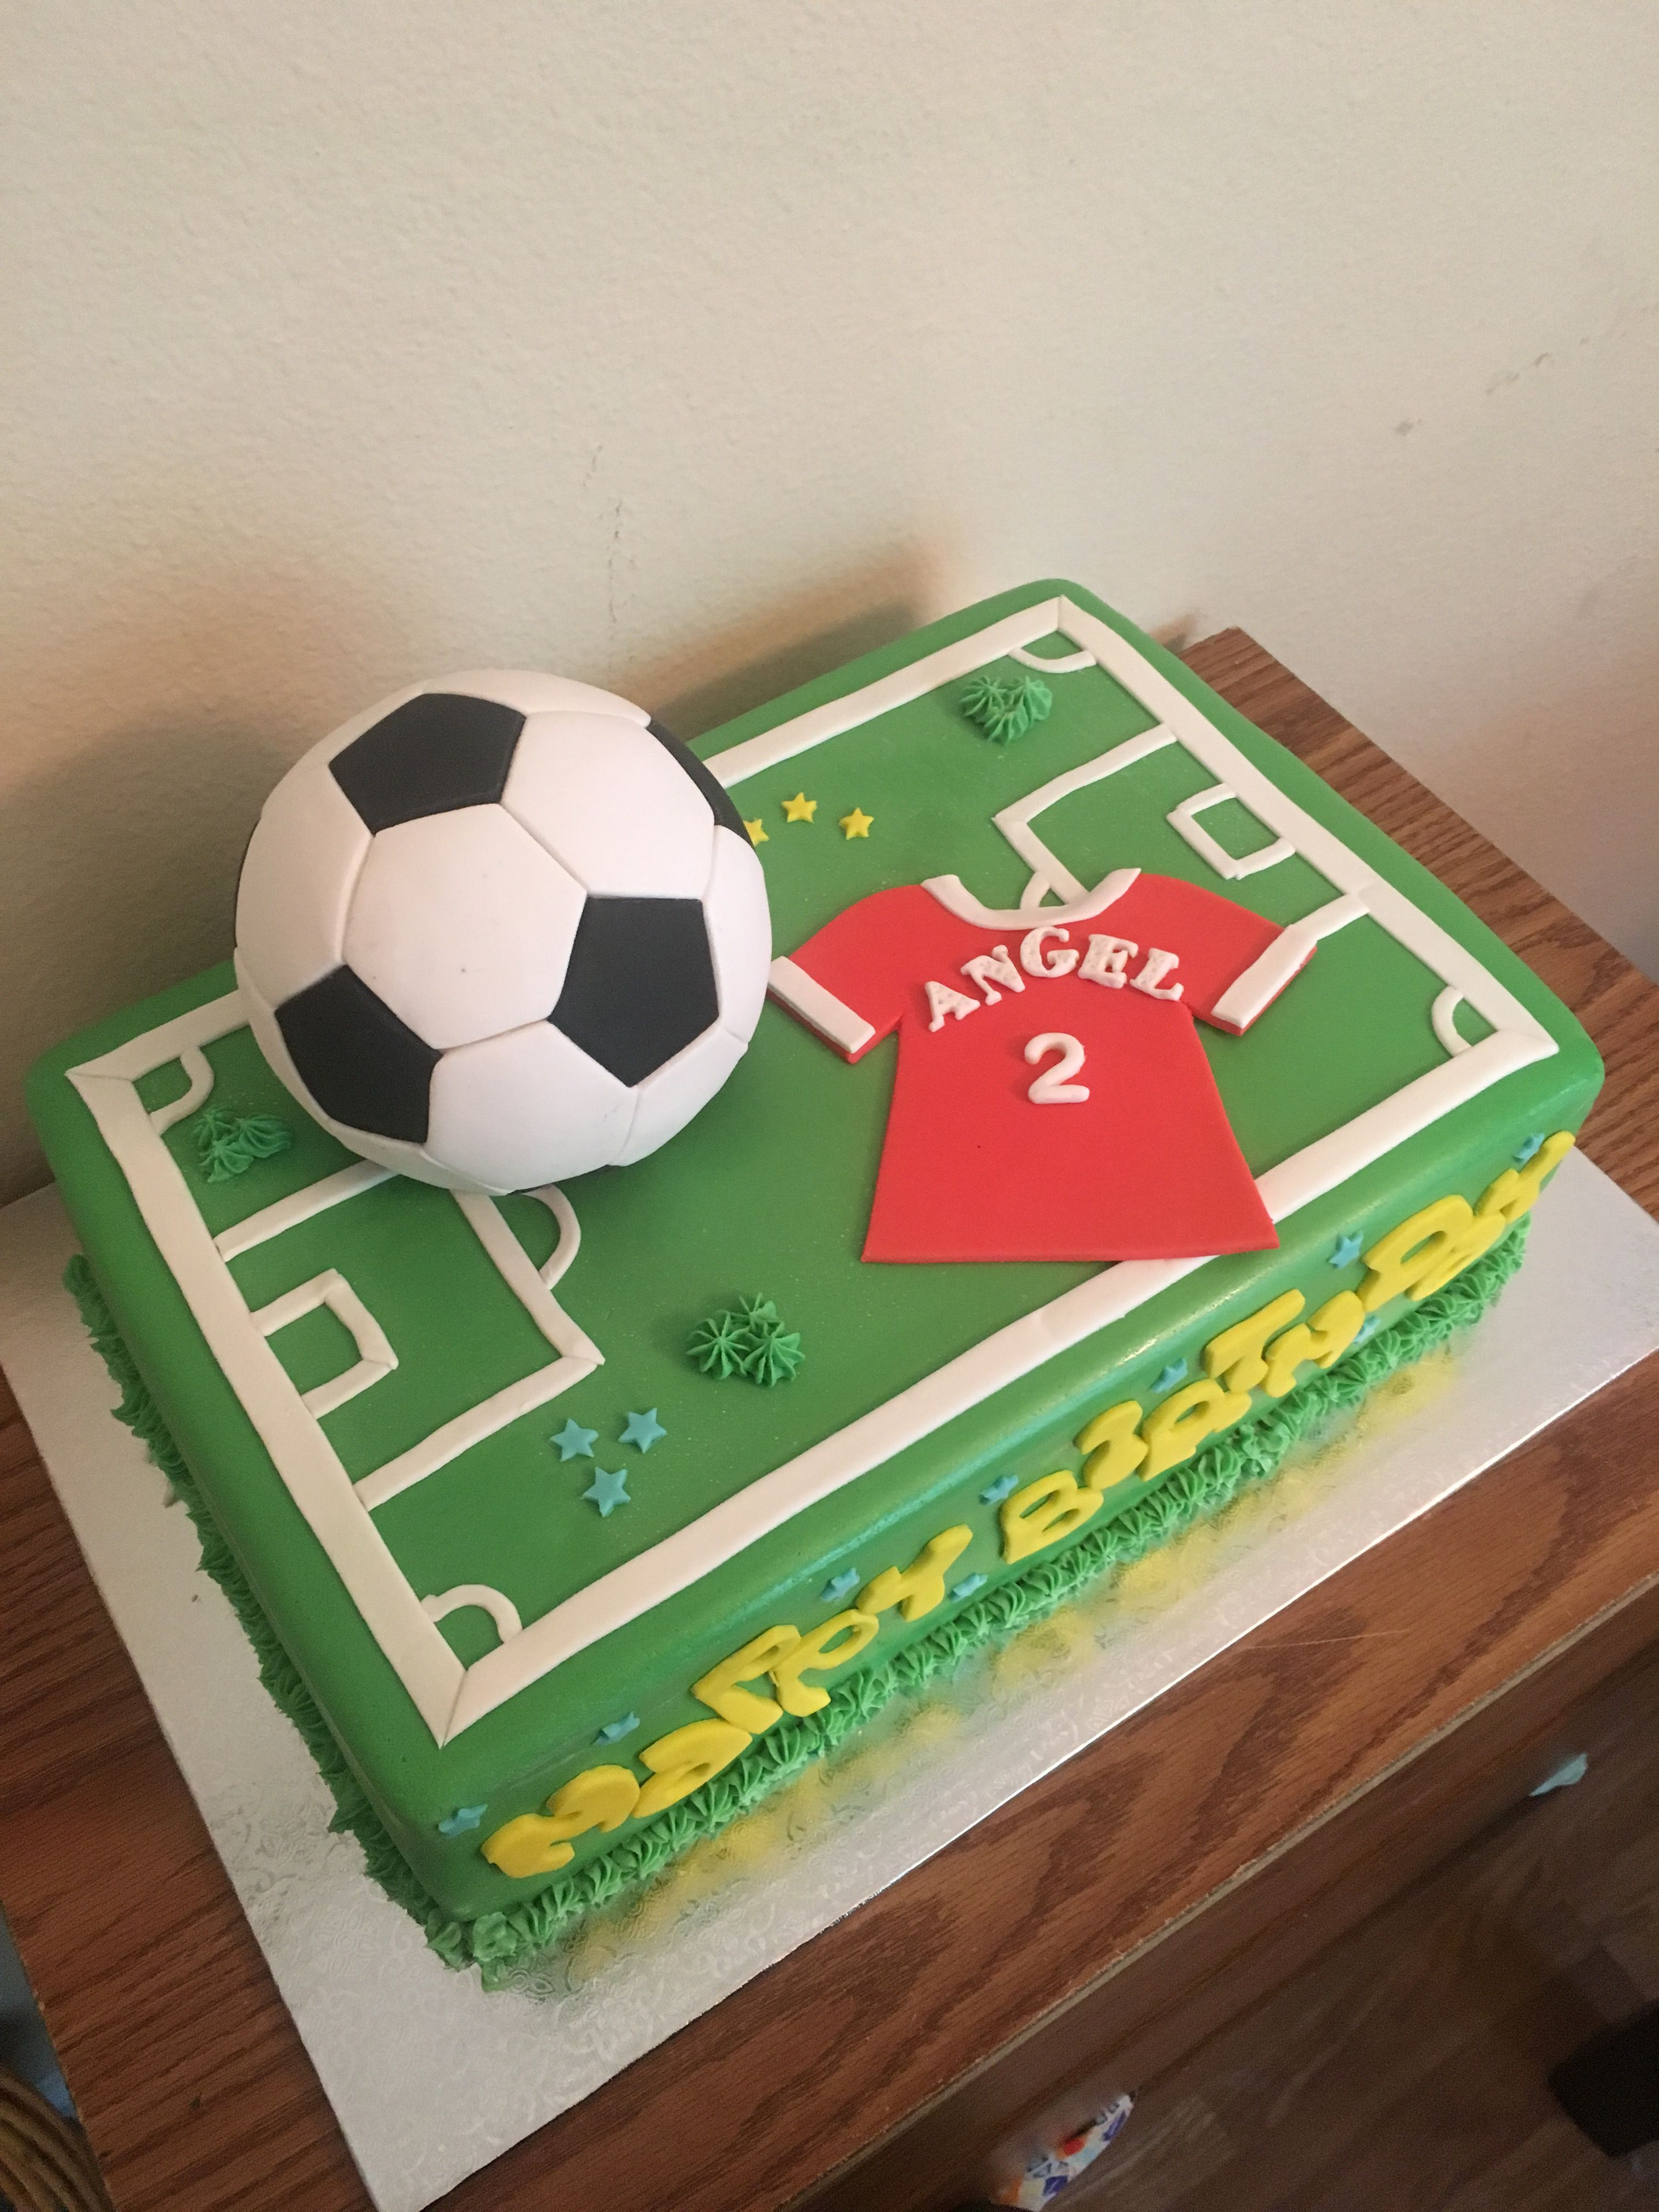 Pin by Jeyxire Mora on Soccer cake | Soccer cake, Cake ...